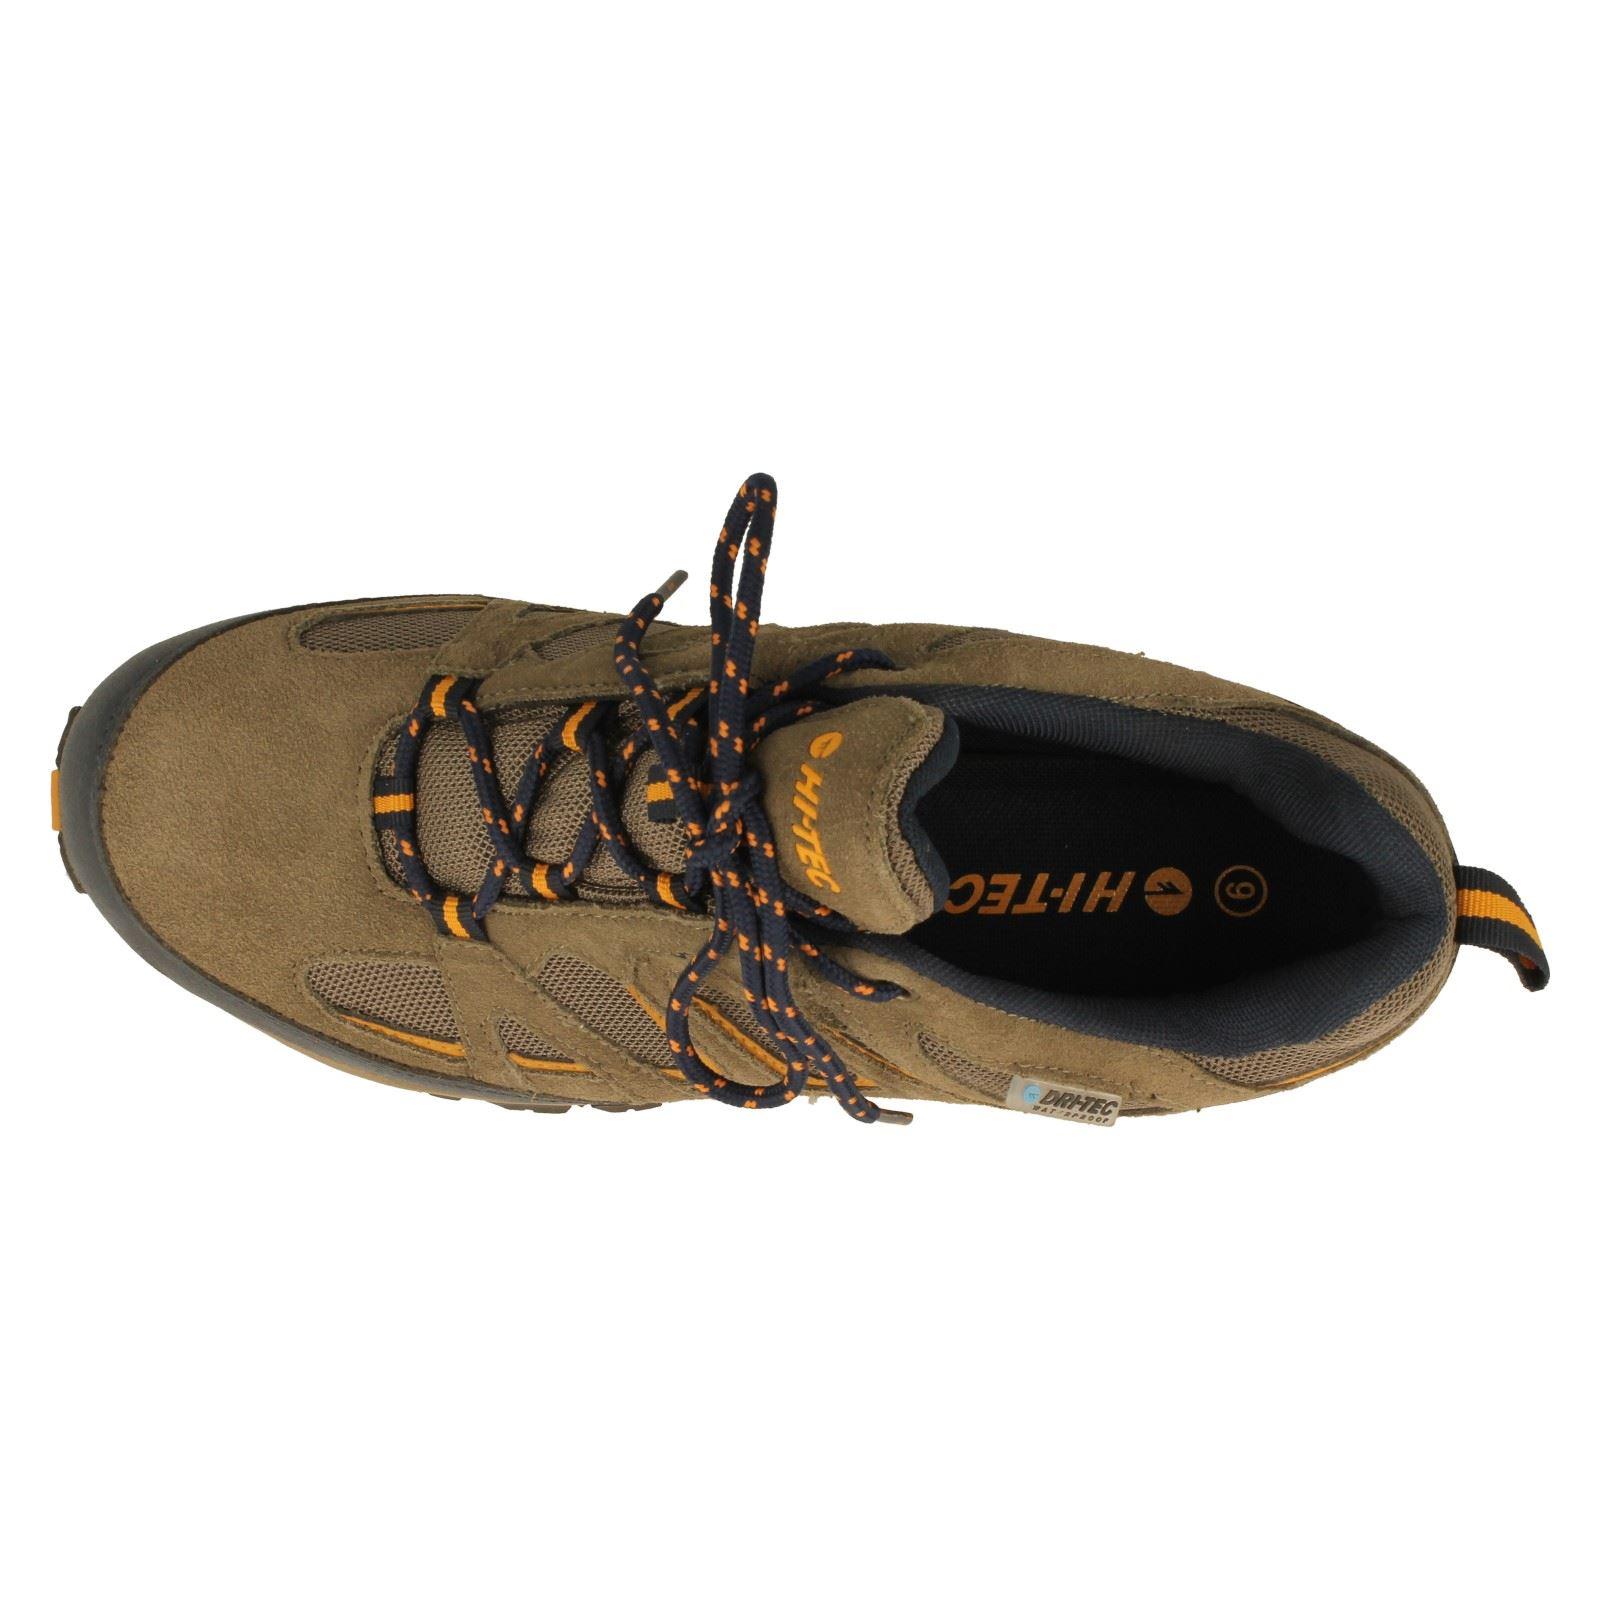 Mens Hi-Tec Waterproof Walking Shoes Label Fusion Sport Low -W